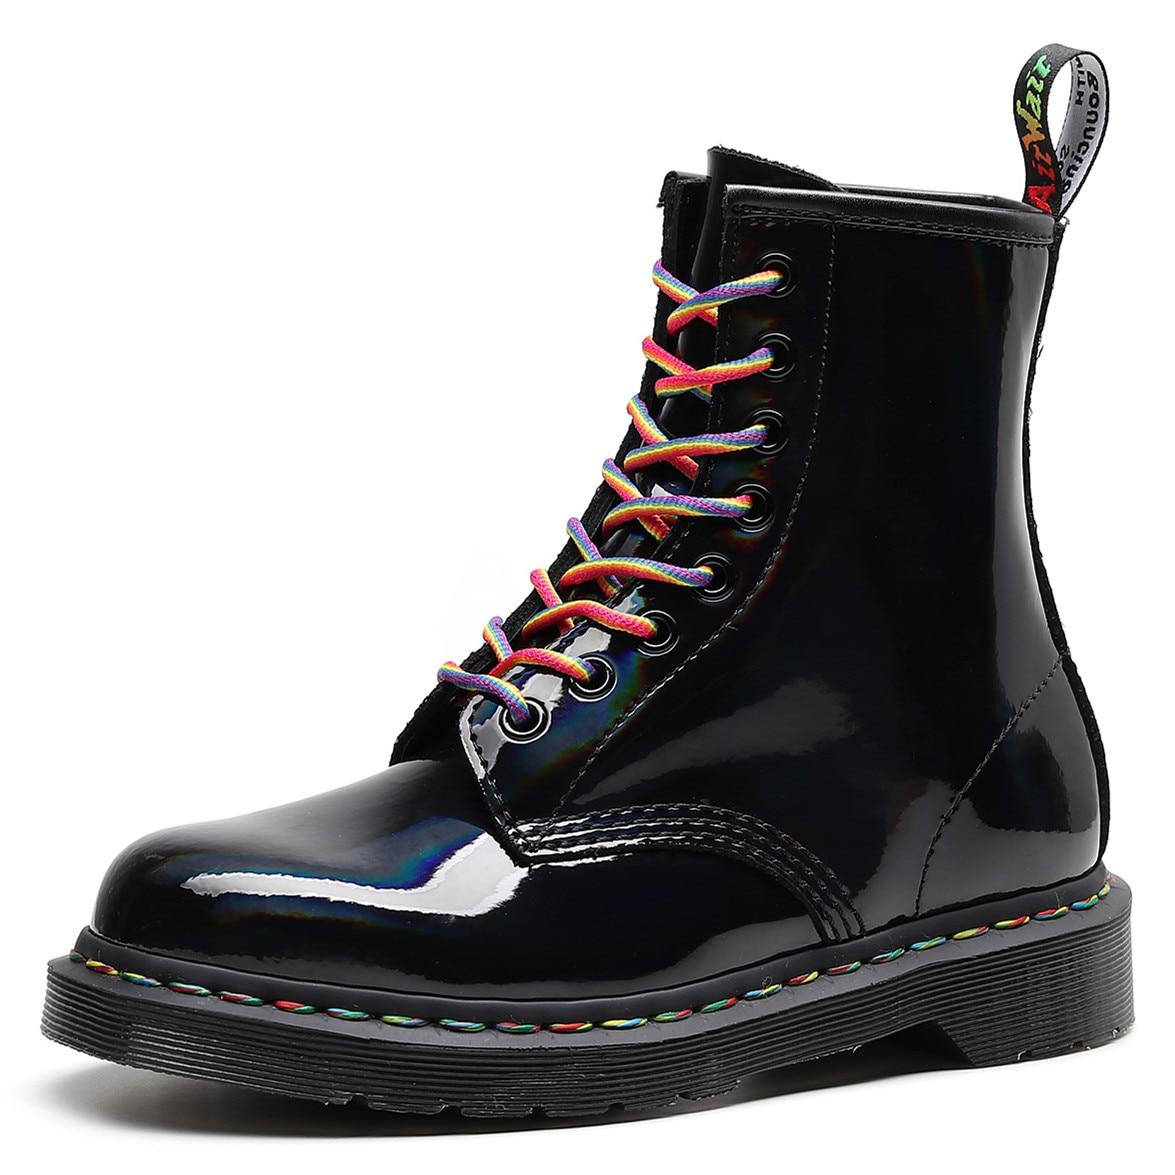 Martens Boots 8-hole Soft Leather Shiny leather Martin Boots Women Boots Men Women Ankle Boots